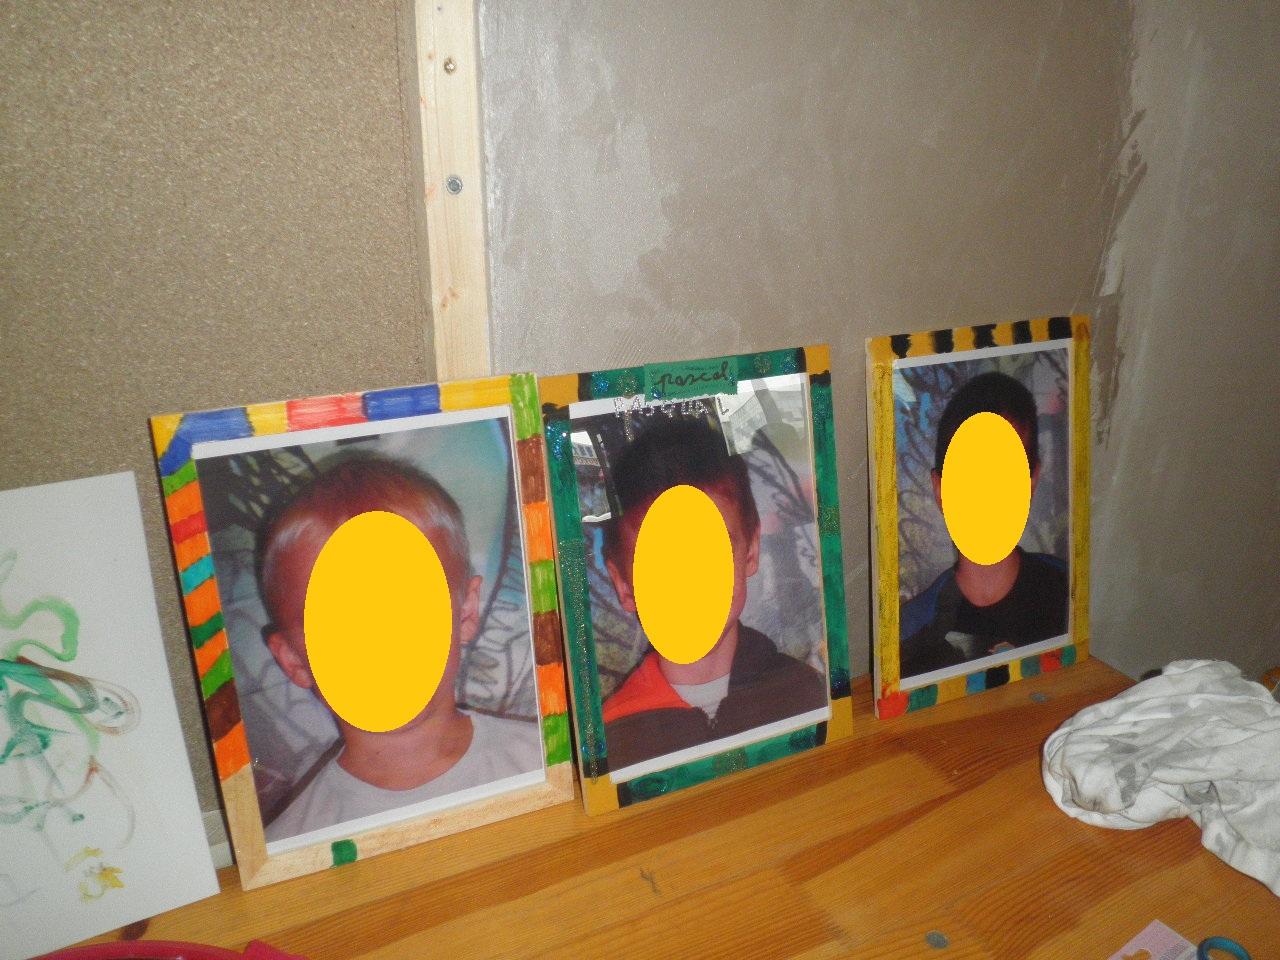 cours enfants leroy merlin metz technopole bricolage enfants. Black Bedroom Furniture Sets. Home Design Ideas